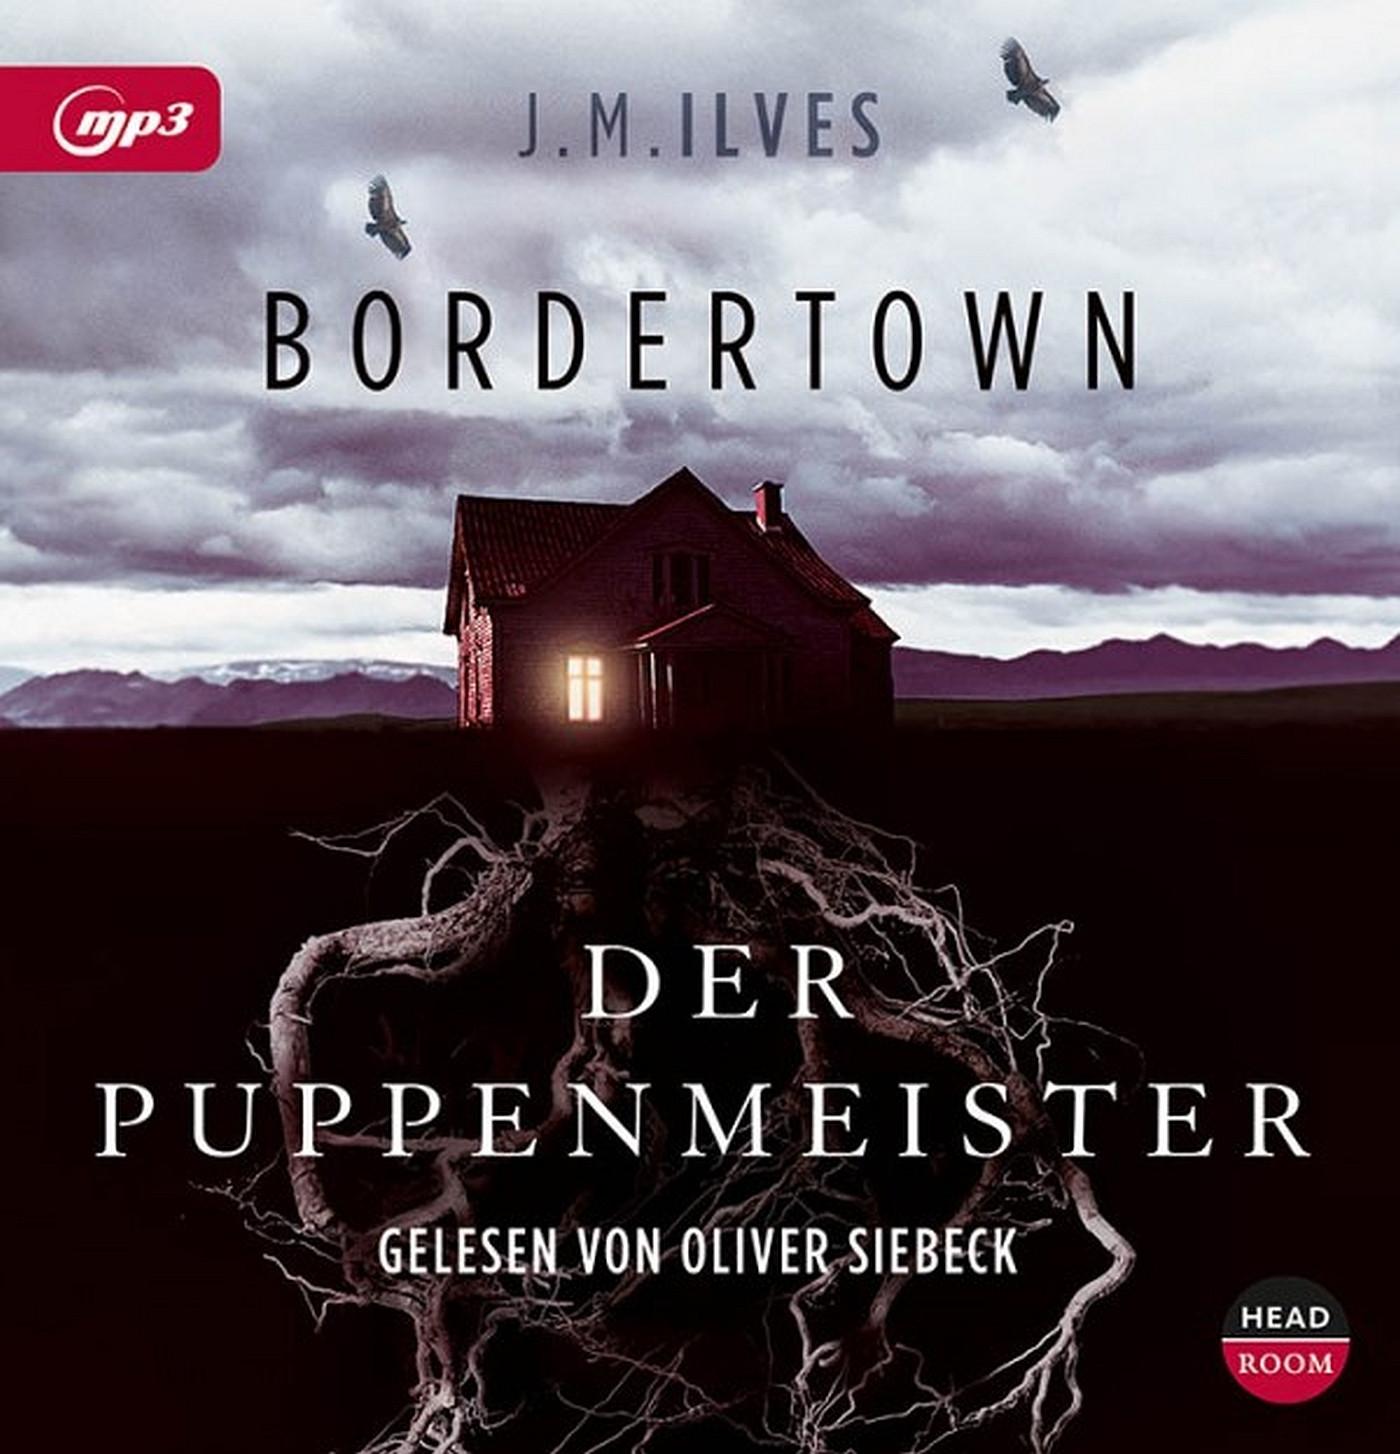 J. M. Ilves - Bordertown: Der Puppenmeister